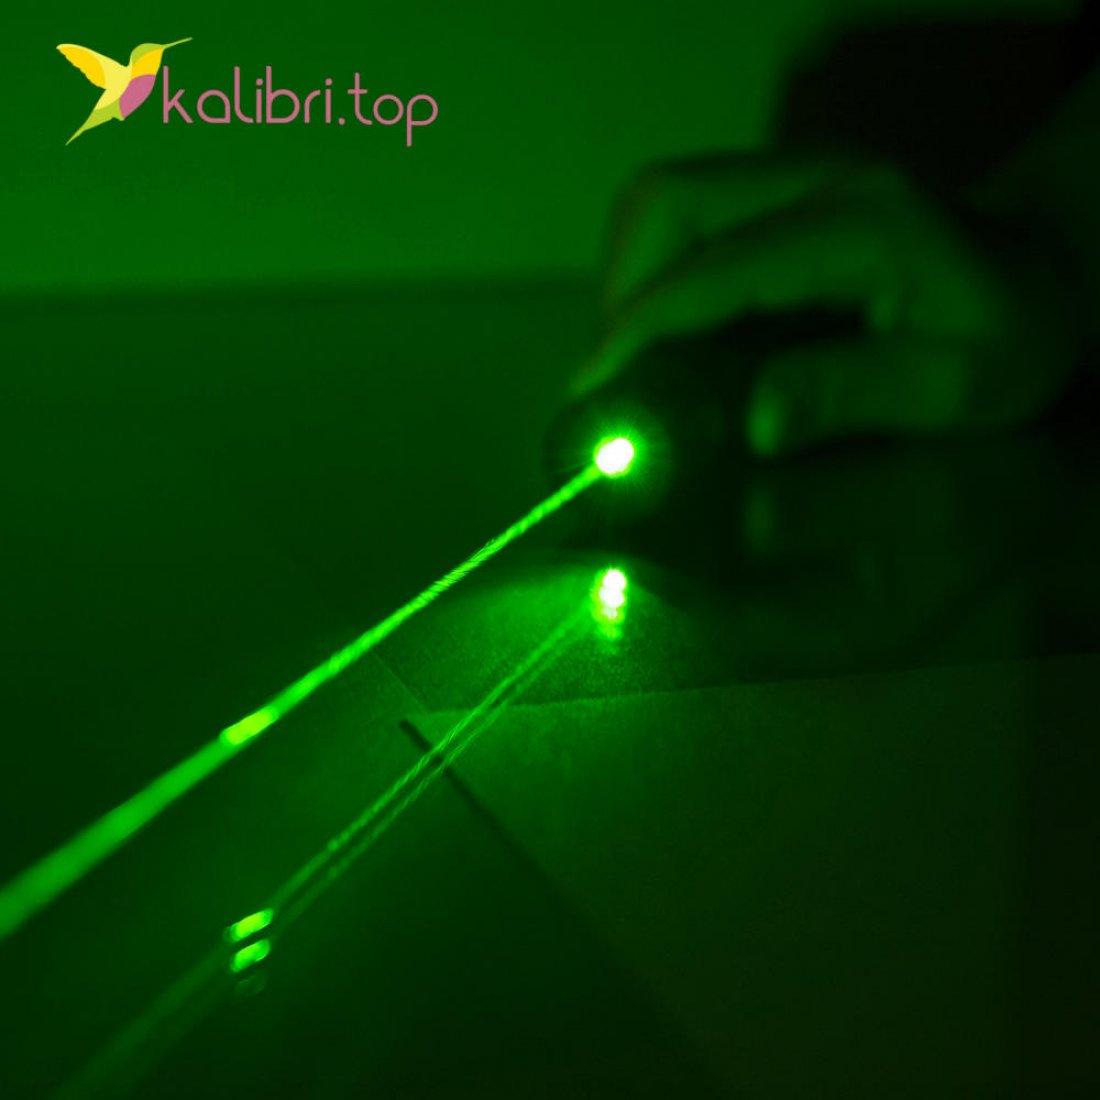 зеленная лазерная указка RL-303 Laser оптом фото 2